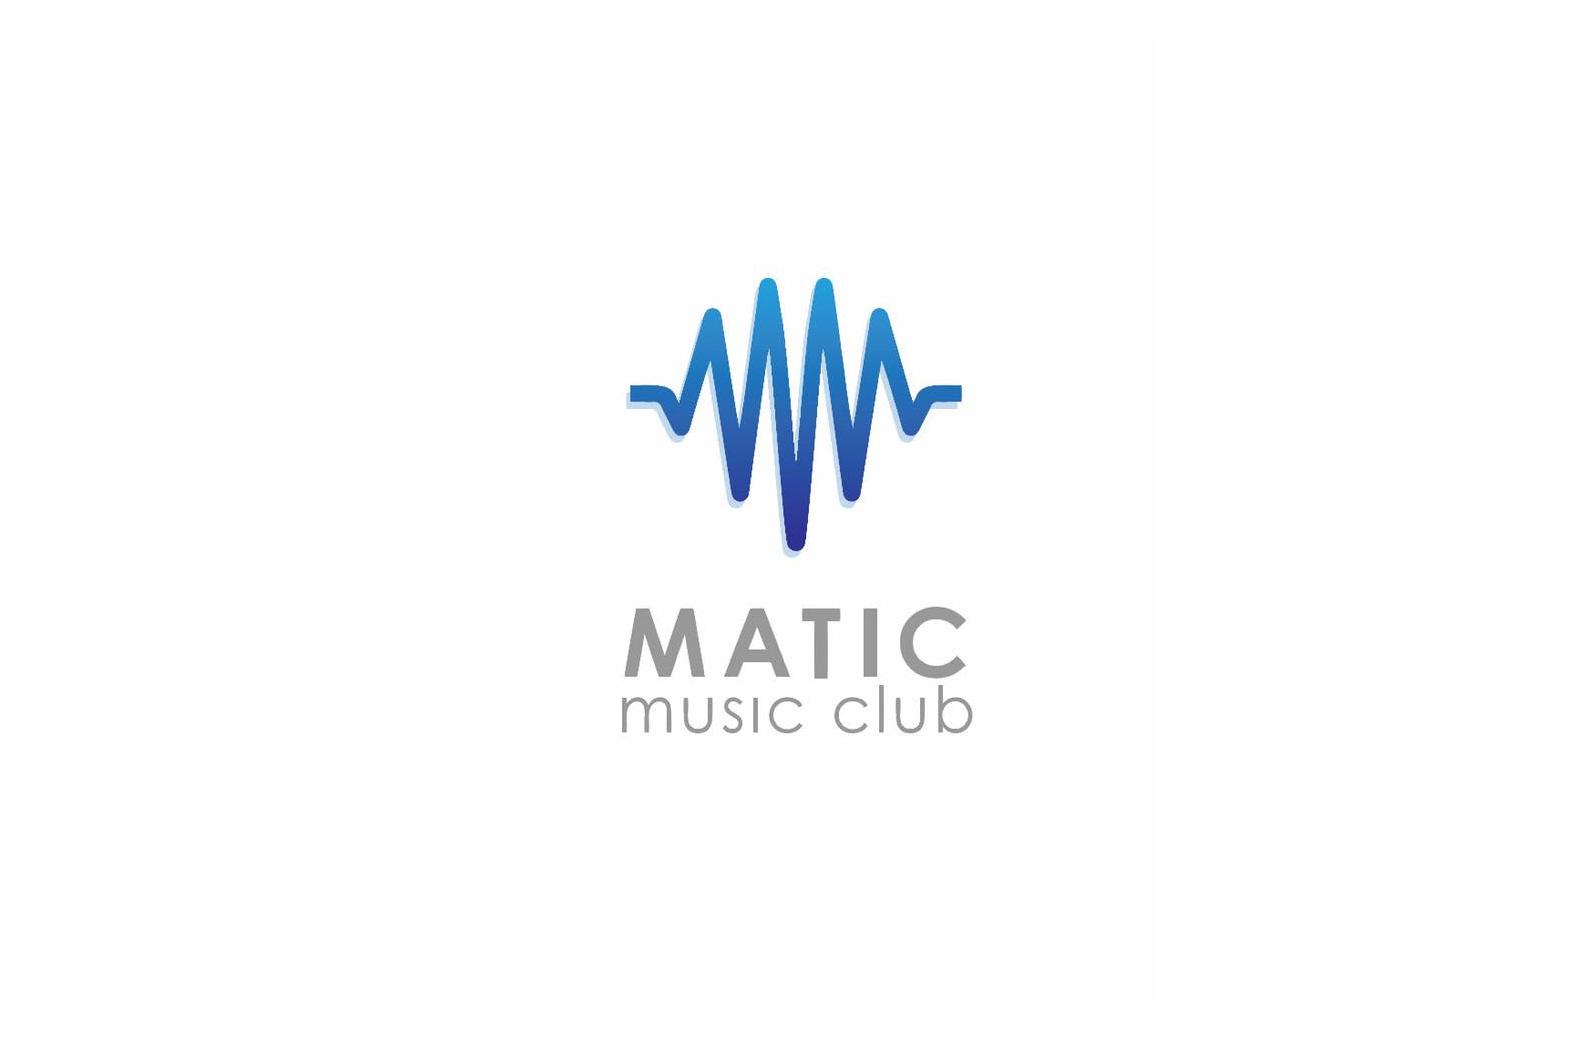 Matic Music Club